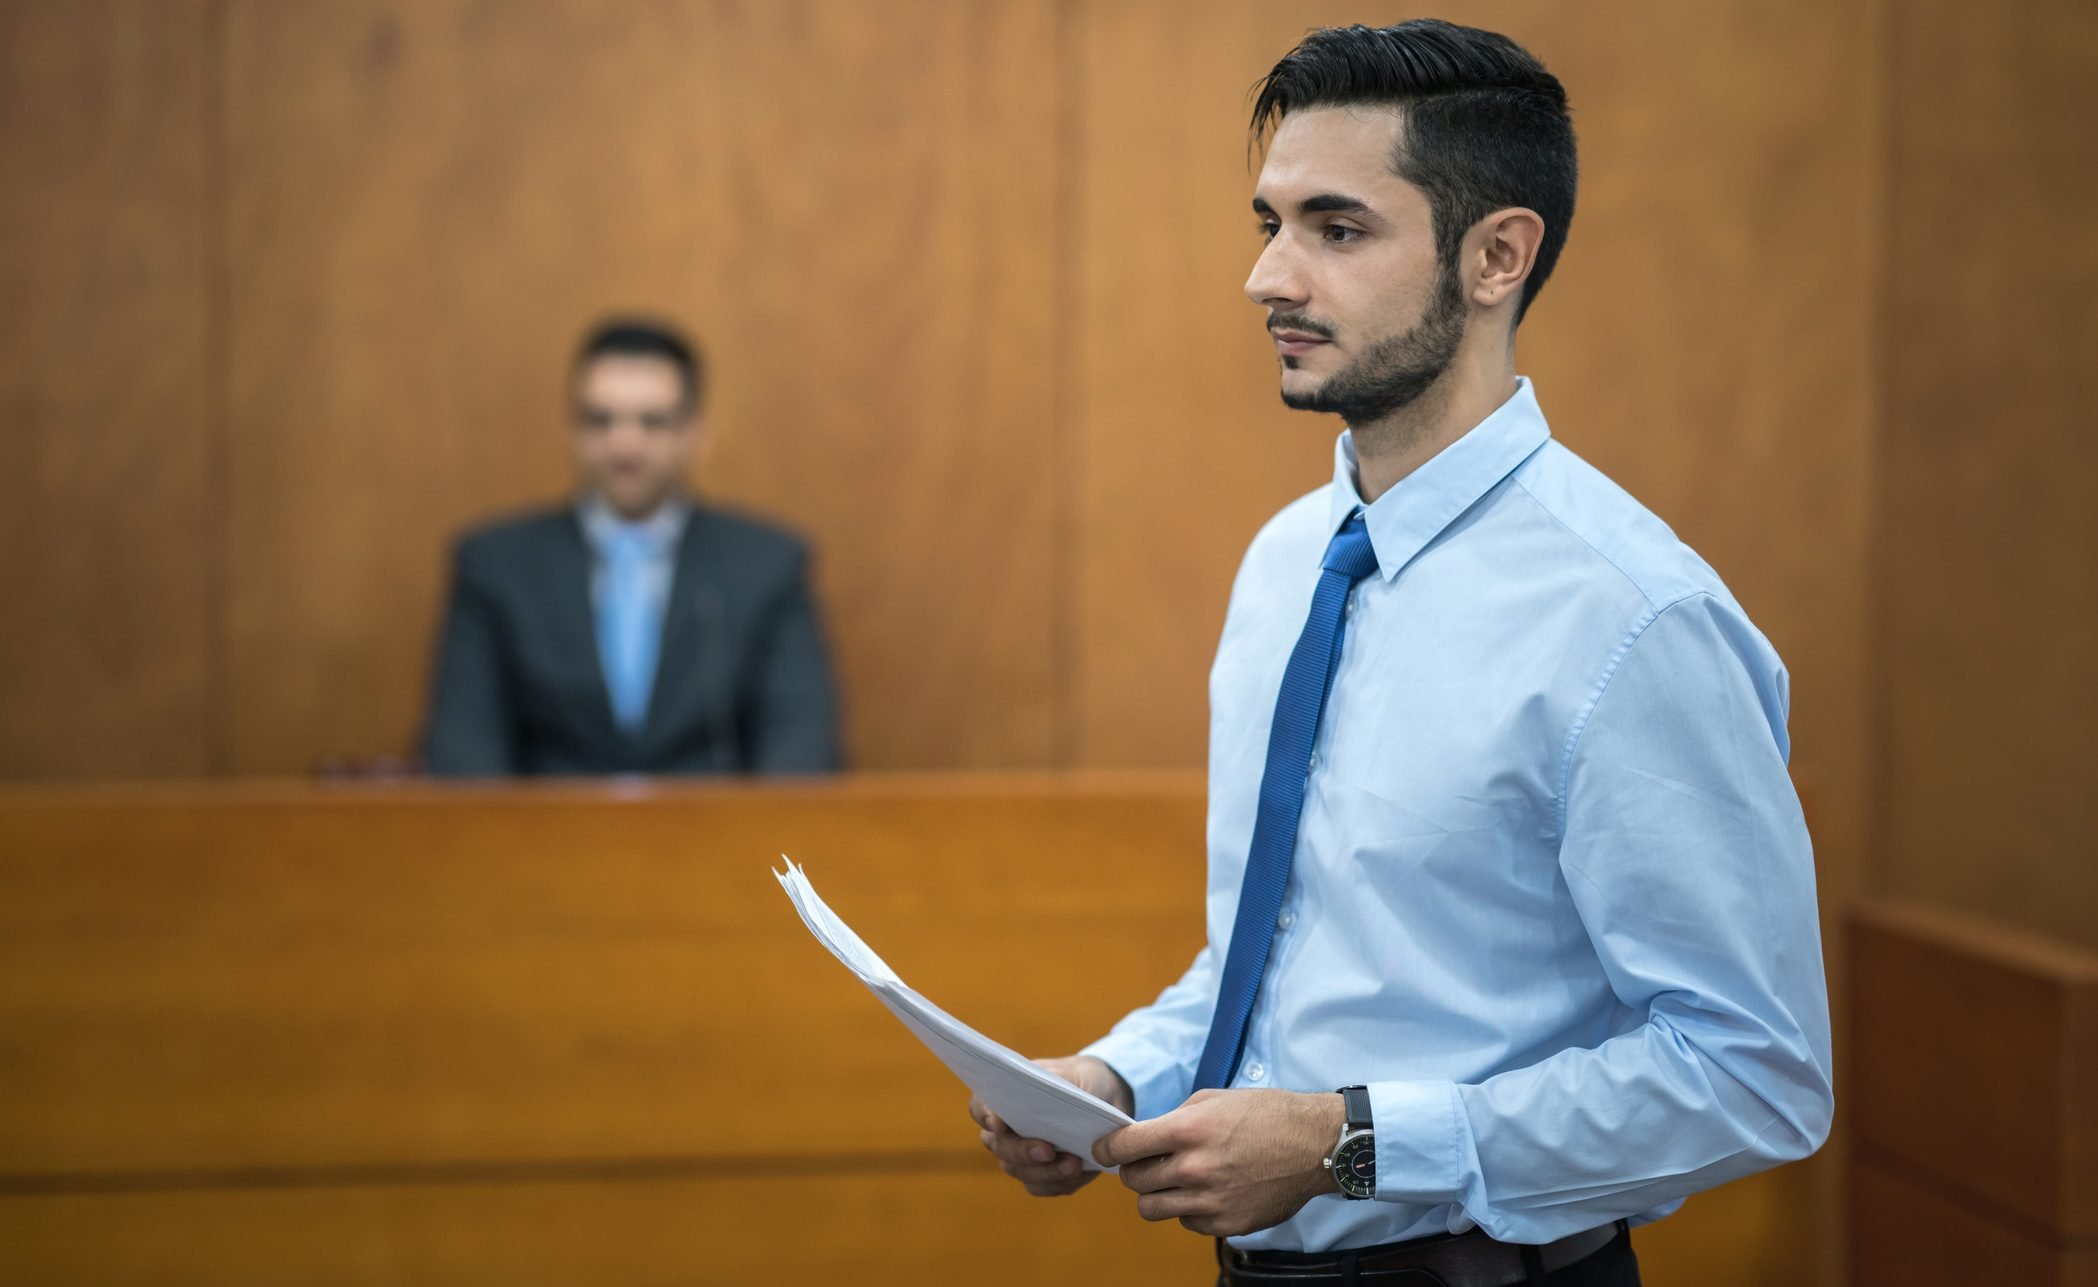 Hiring A Criminal Defense Lawyer Versus A General